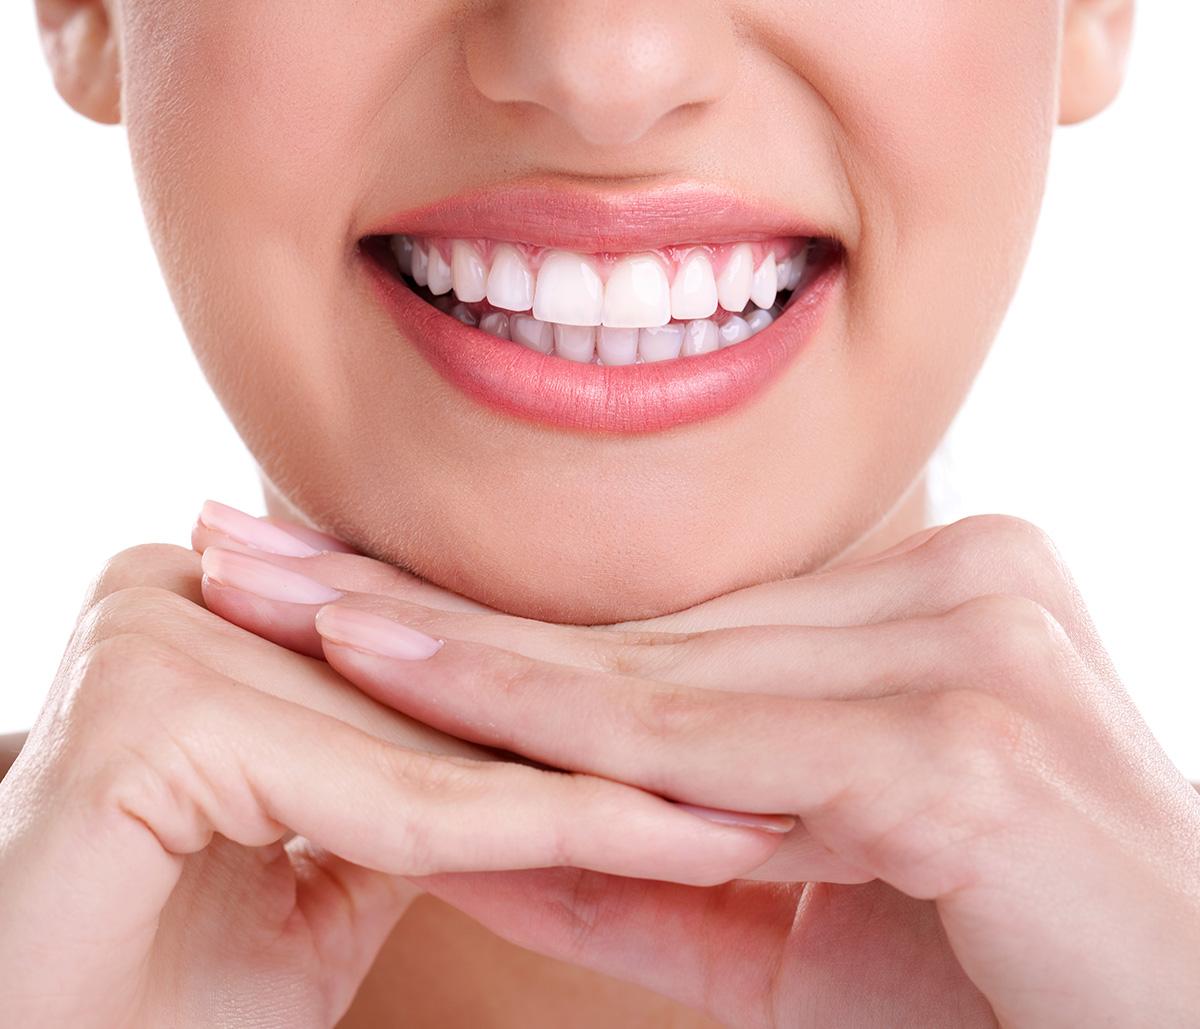 Teeth Whitening System Fort Worth TX